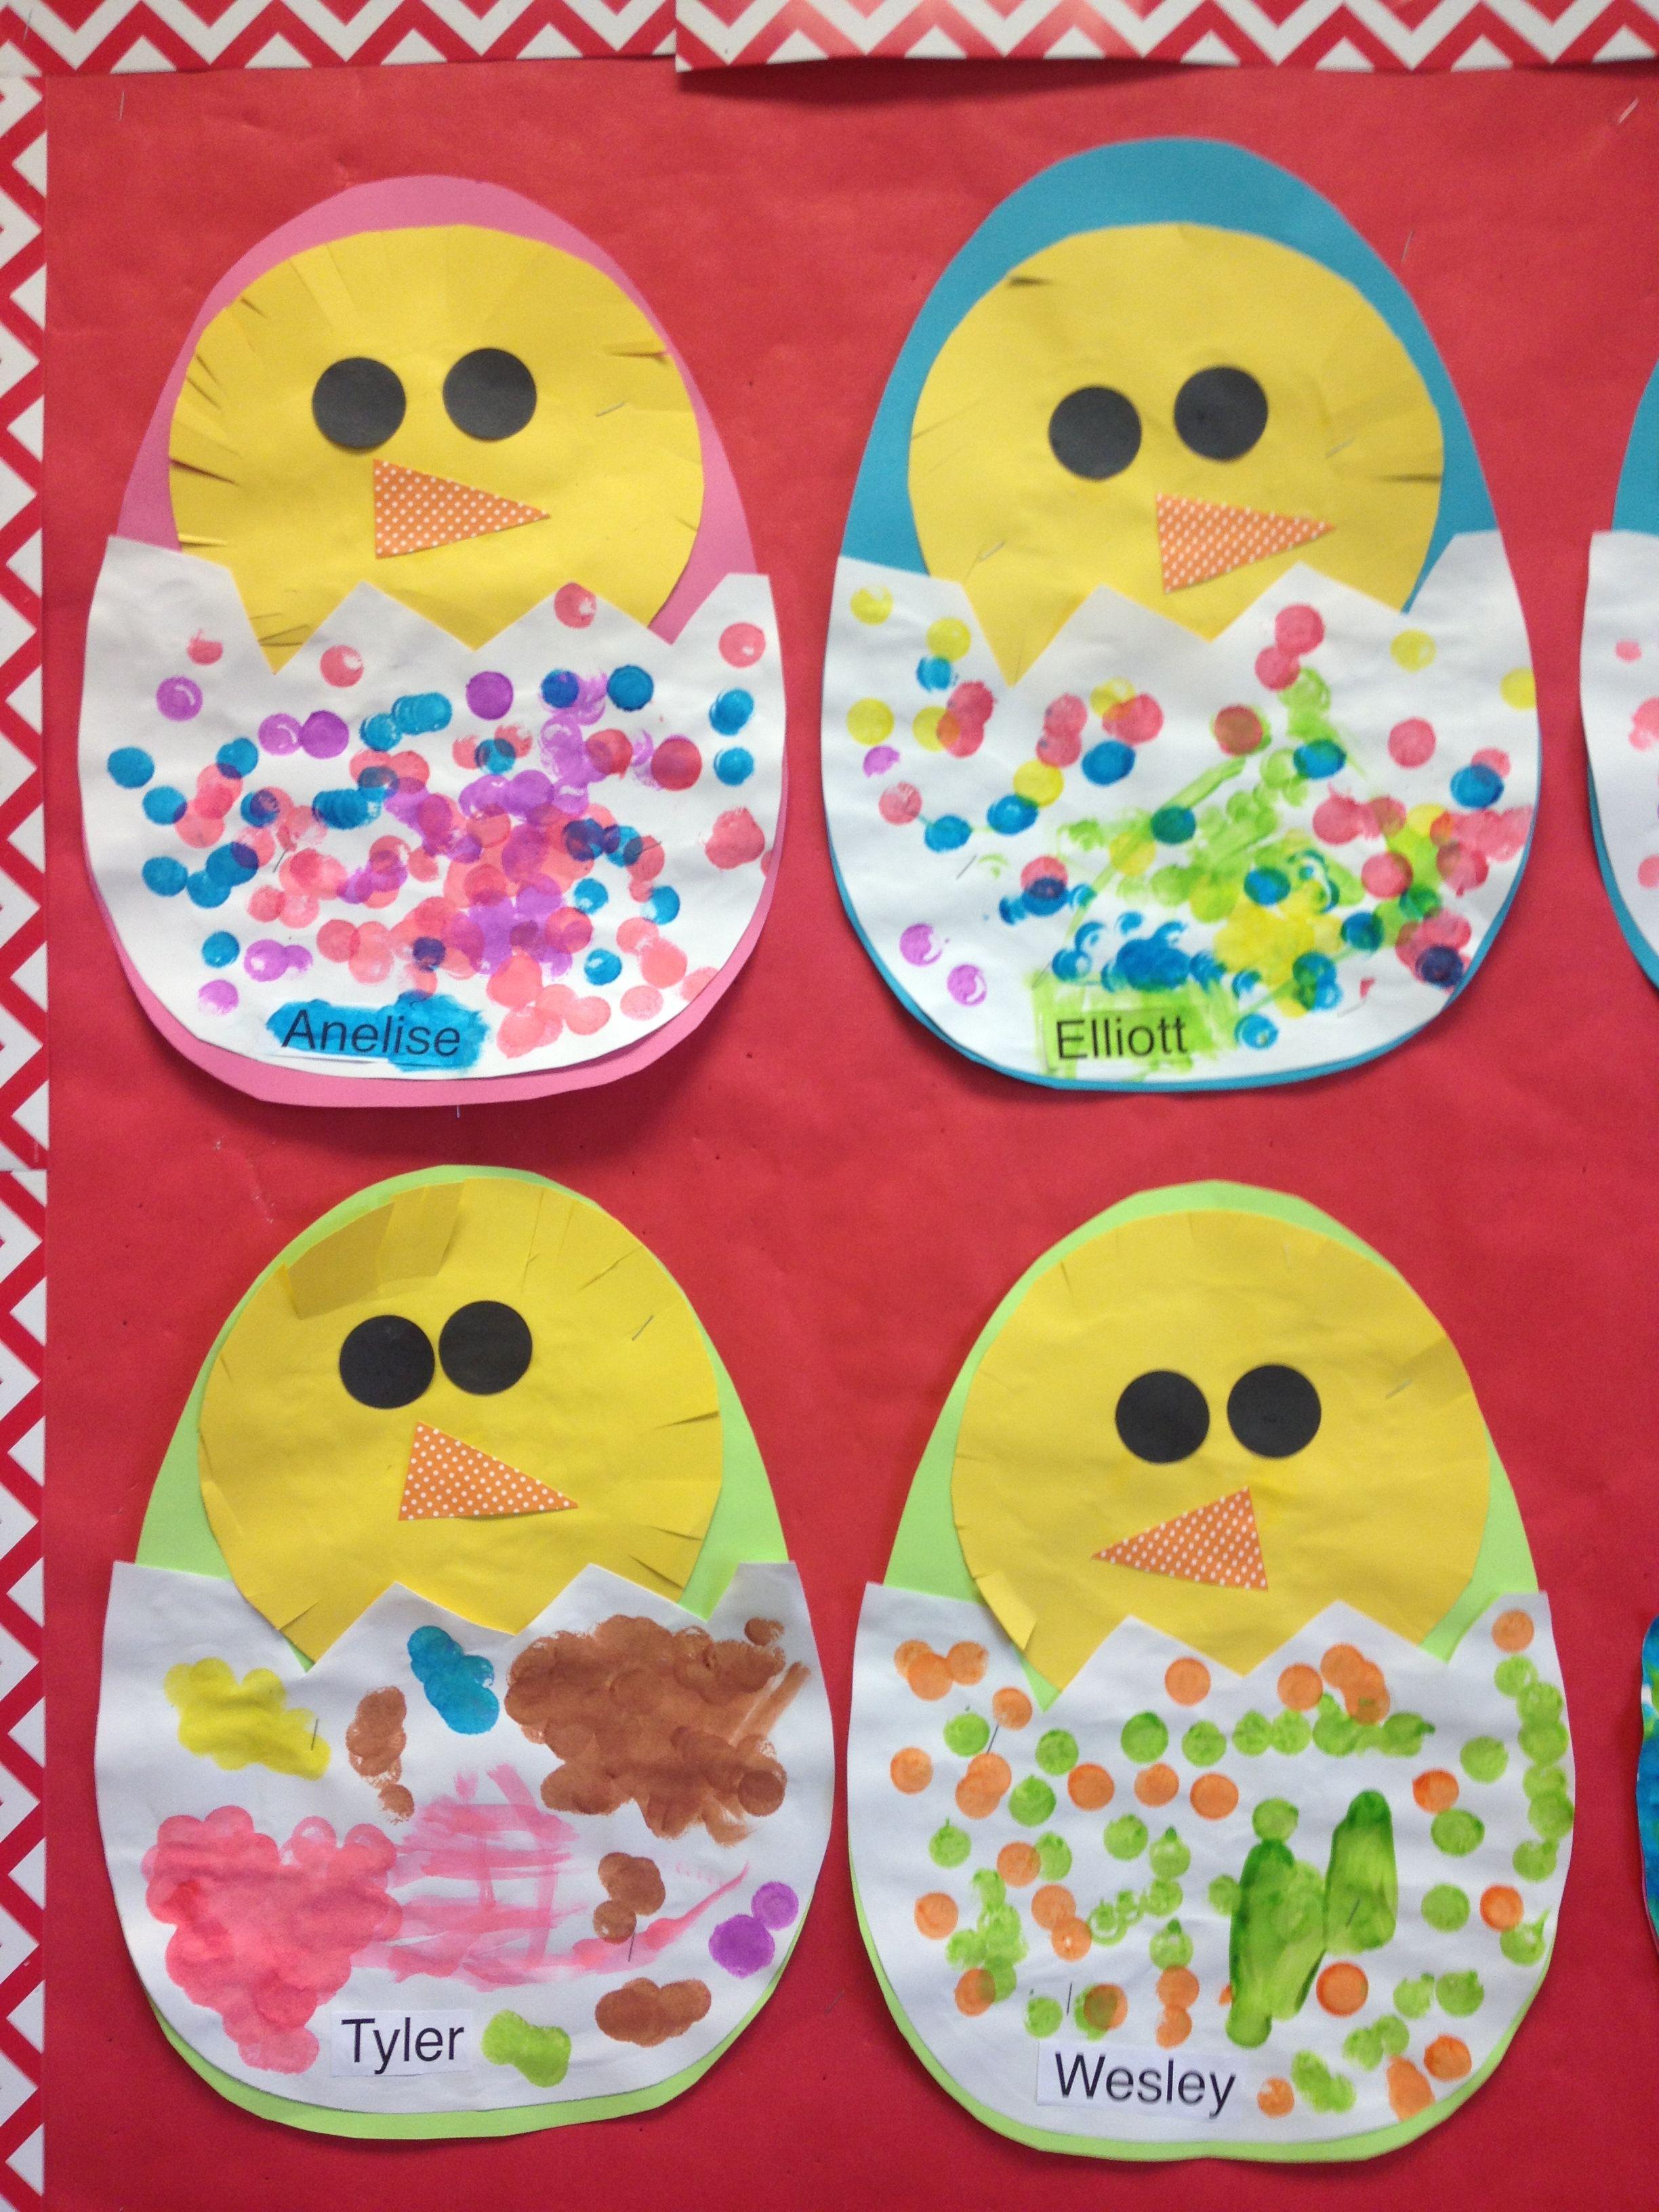 Chicks in eggs preschool pinterest ostern diy - Bastelideen ostern kindergarten ...